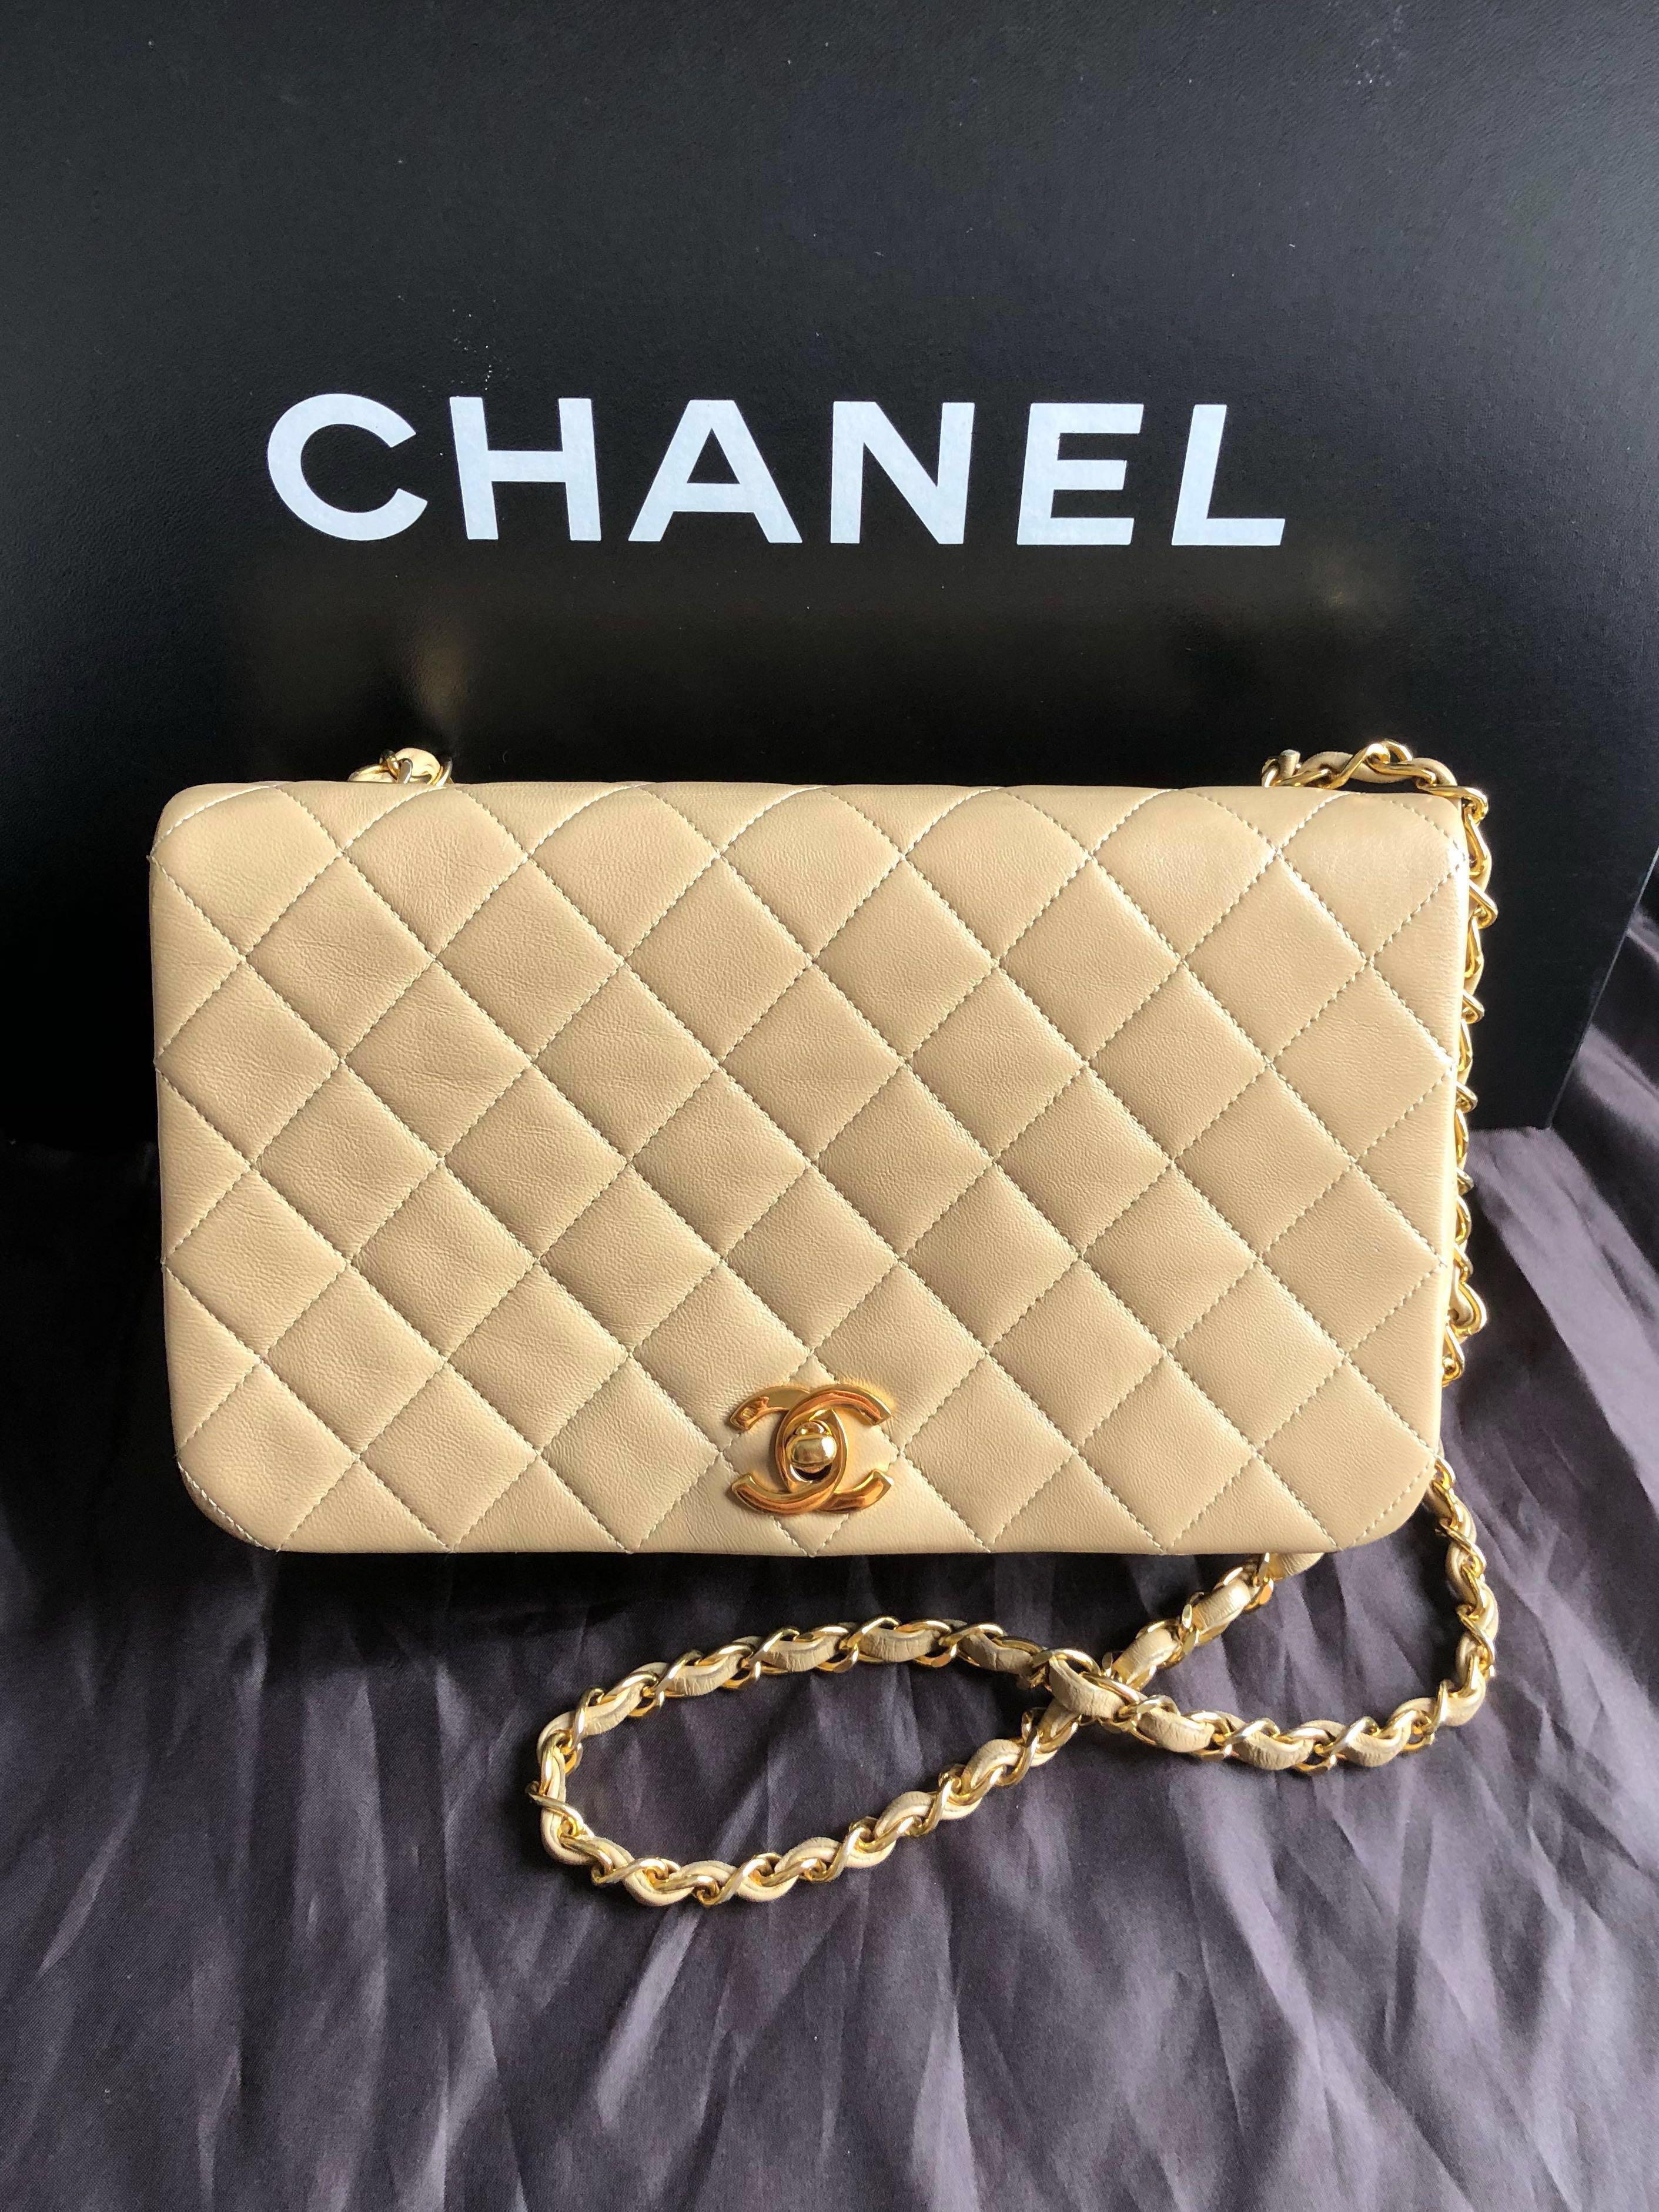 41627ce4872b4f Chanel Beige Vintage 9 Inch Flap Bag in Calfskin, Luxury, Bags ...